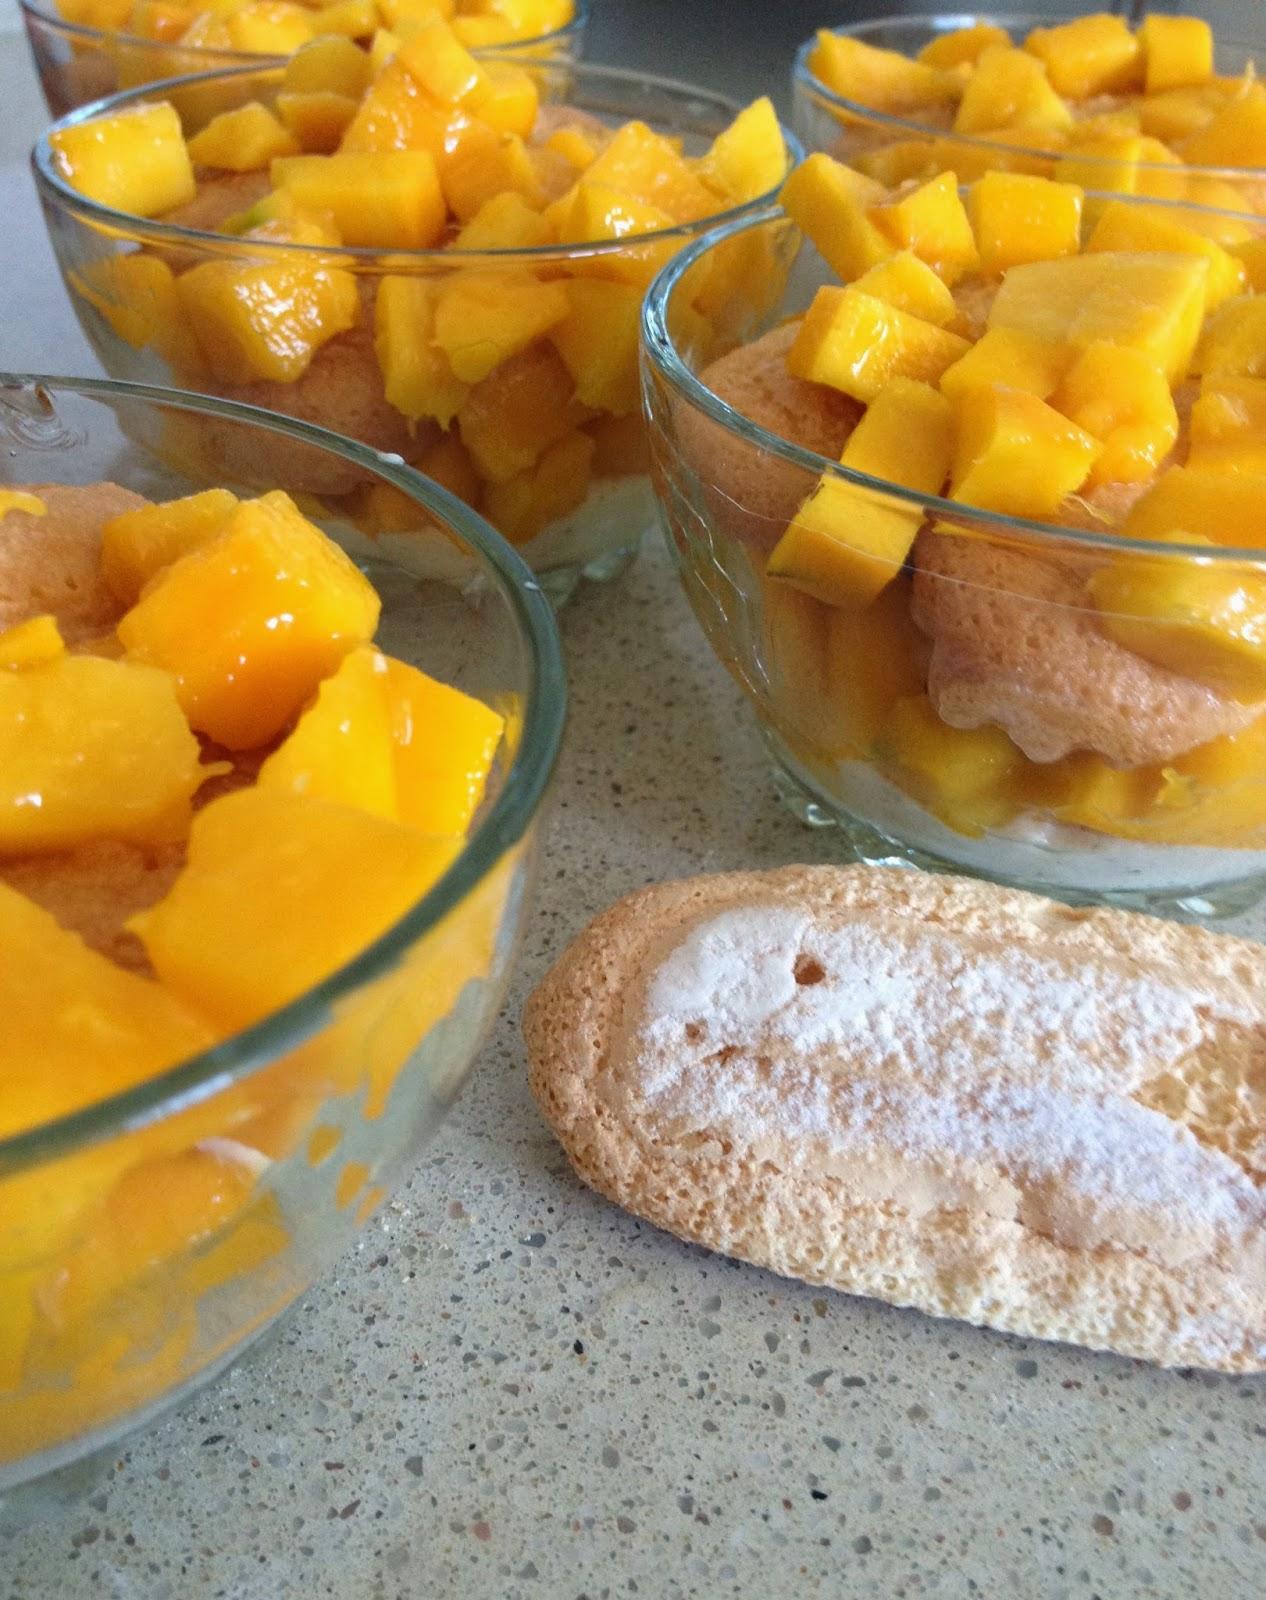 Sweet Kwisine, mangue, tiramisu, mascarpone, mango, cuisine antillaise, végétarien, dessert, crème, vanille, cuisine antillaise, martinique, bassignac, mangue Julie